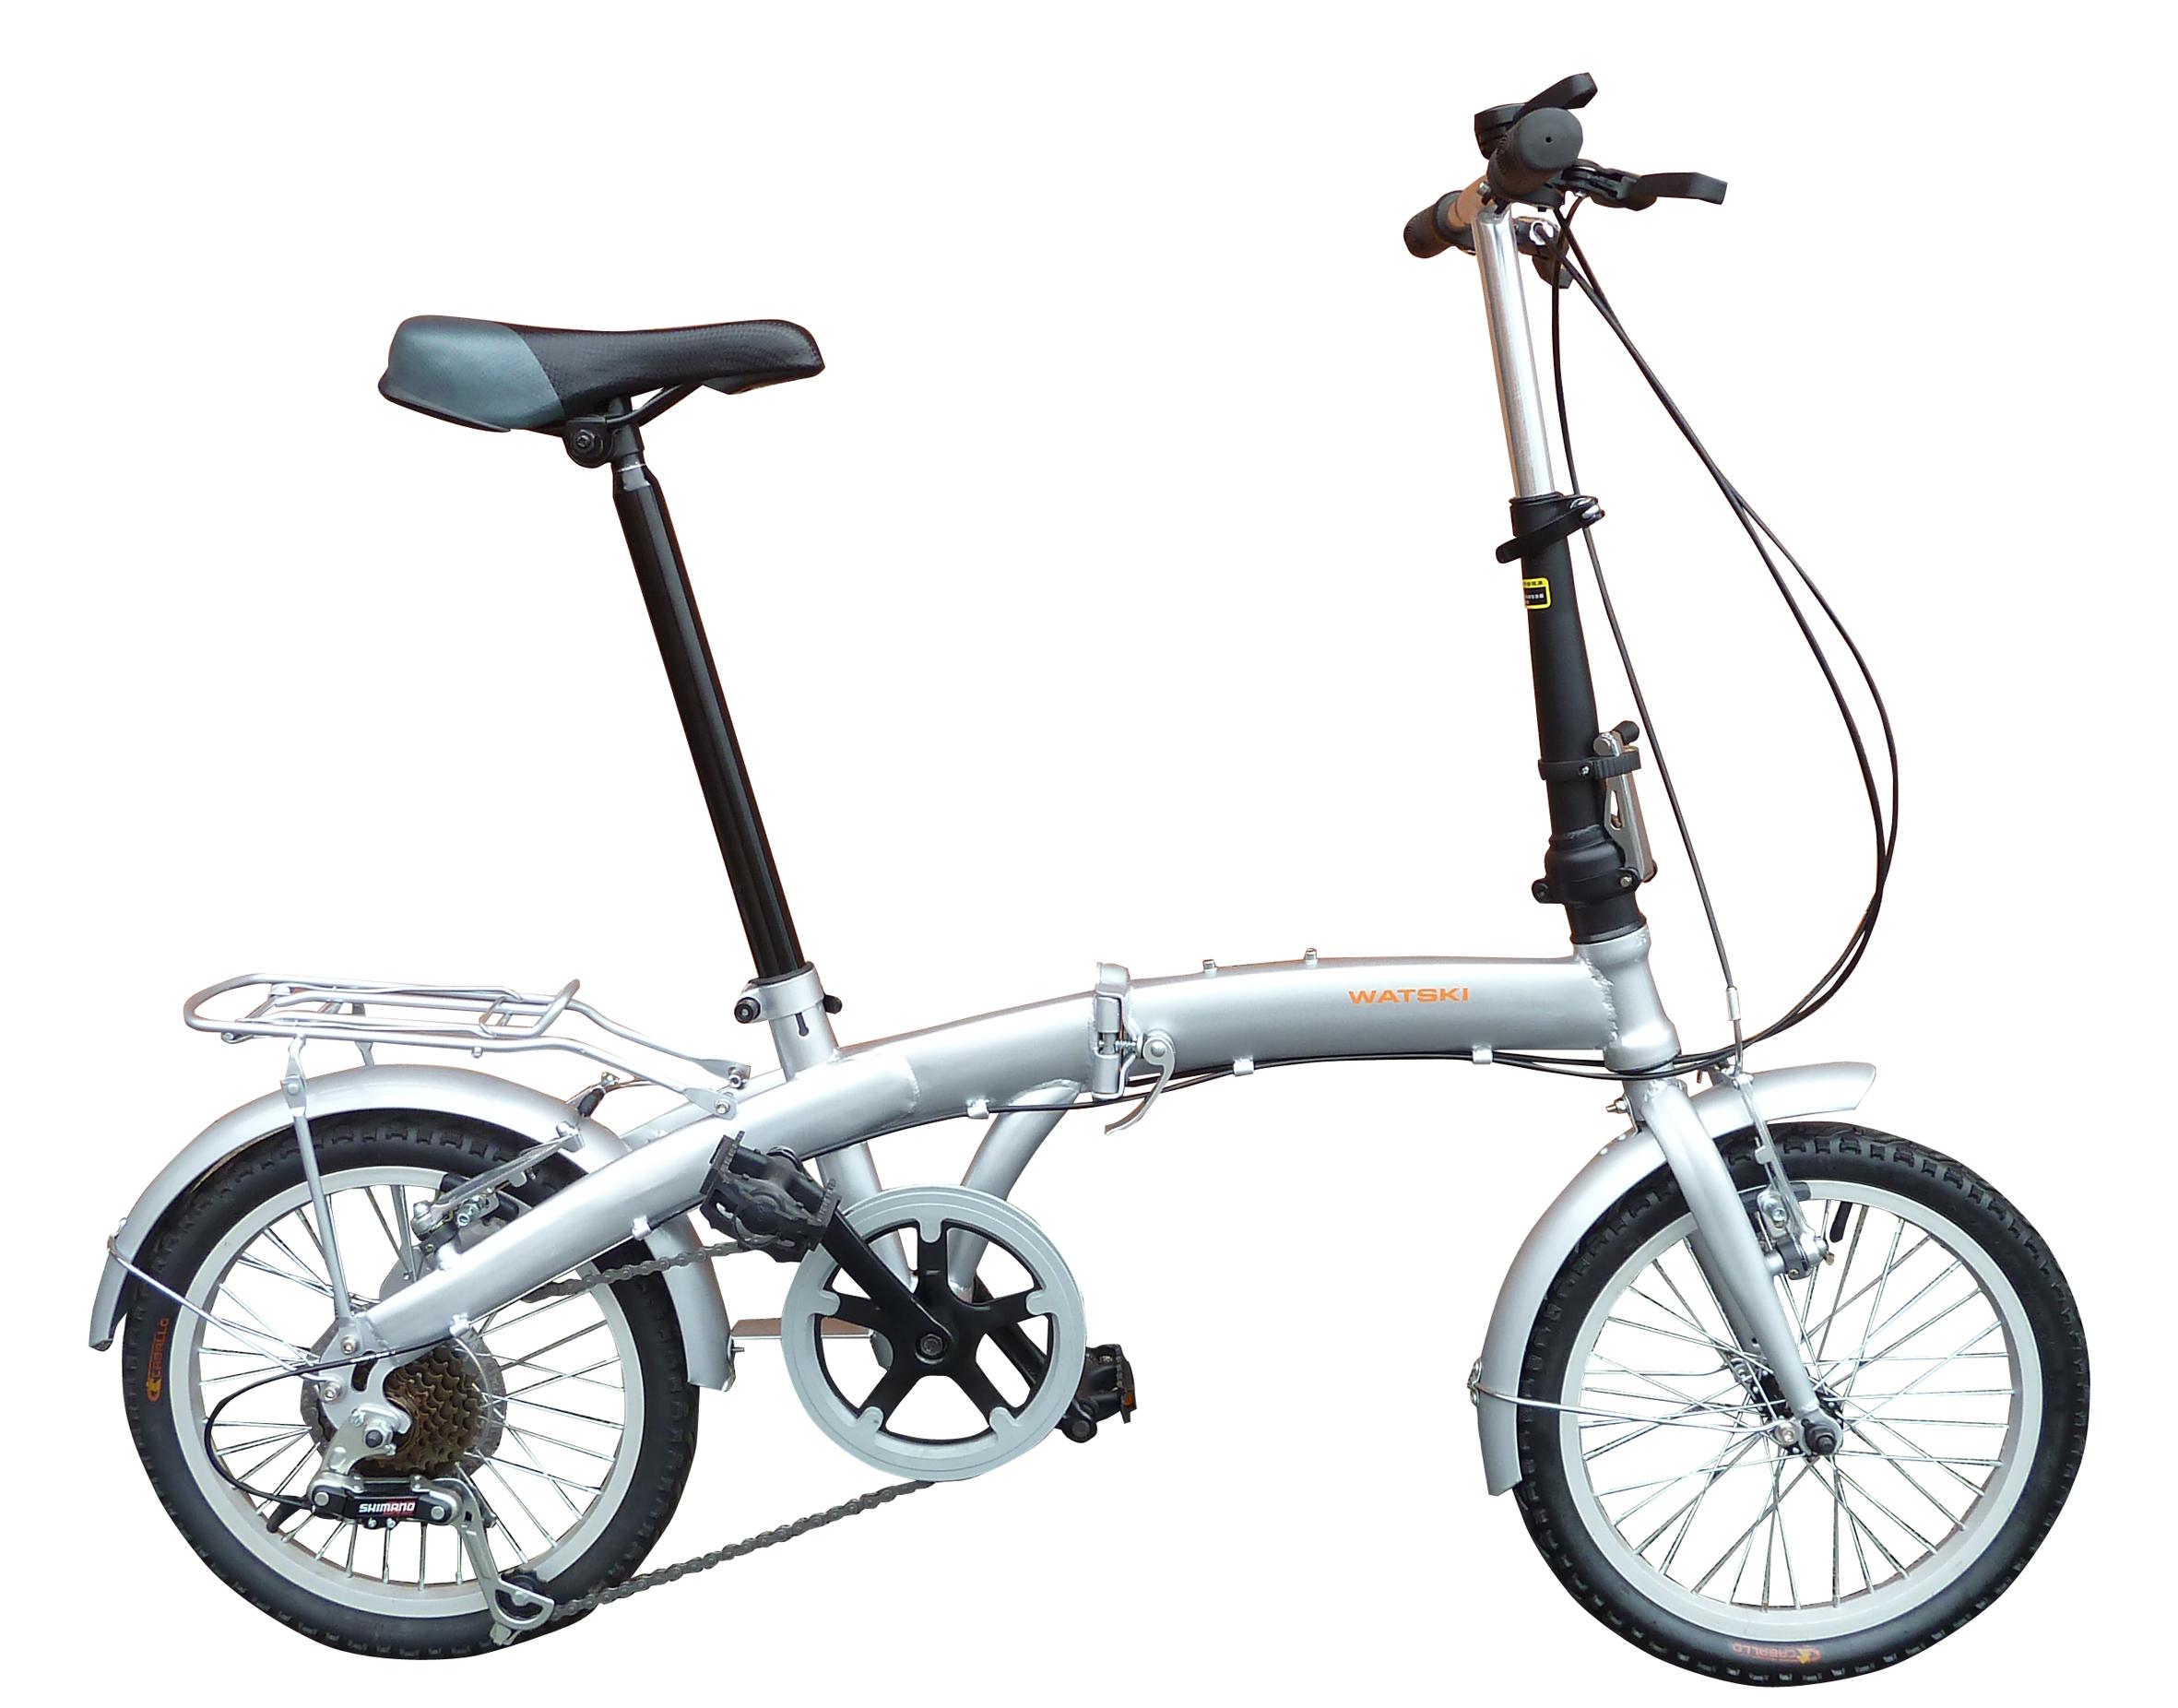 Cykel med 6 gear og 16'' tommer hjul - Cykler